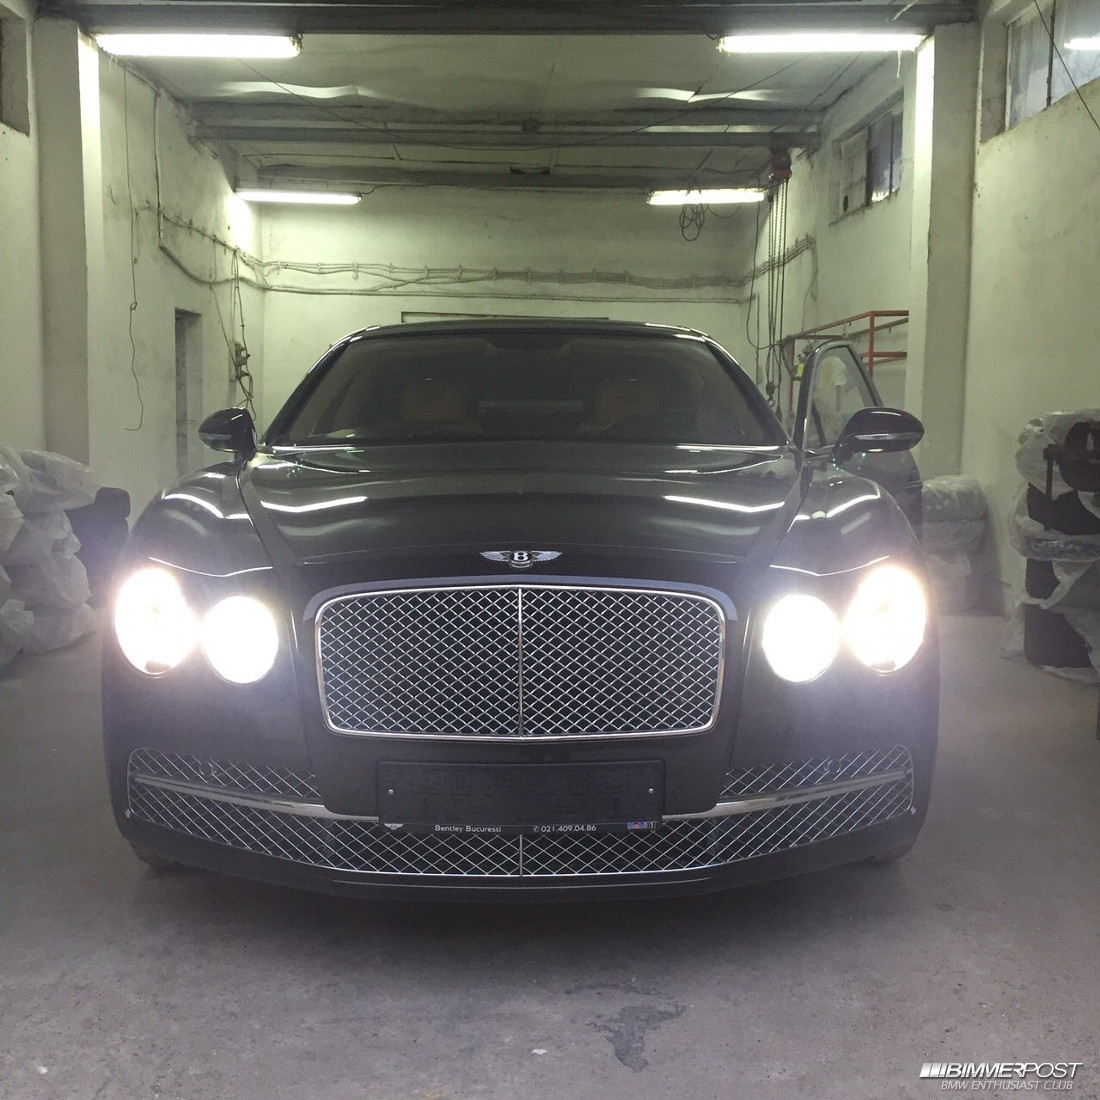 2006 Bentley Flying Spur: Teodorjelev's 2016 Bentley Flying Spur W12